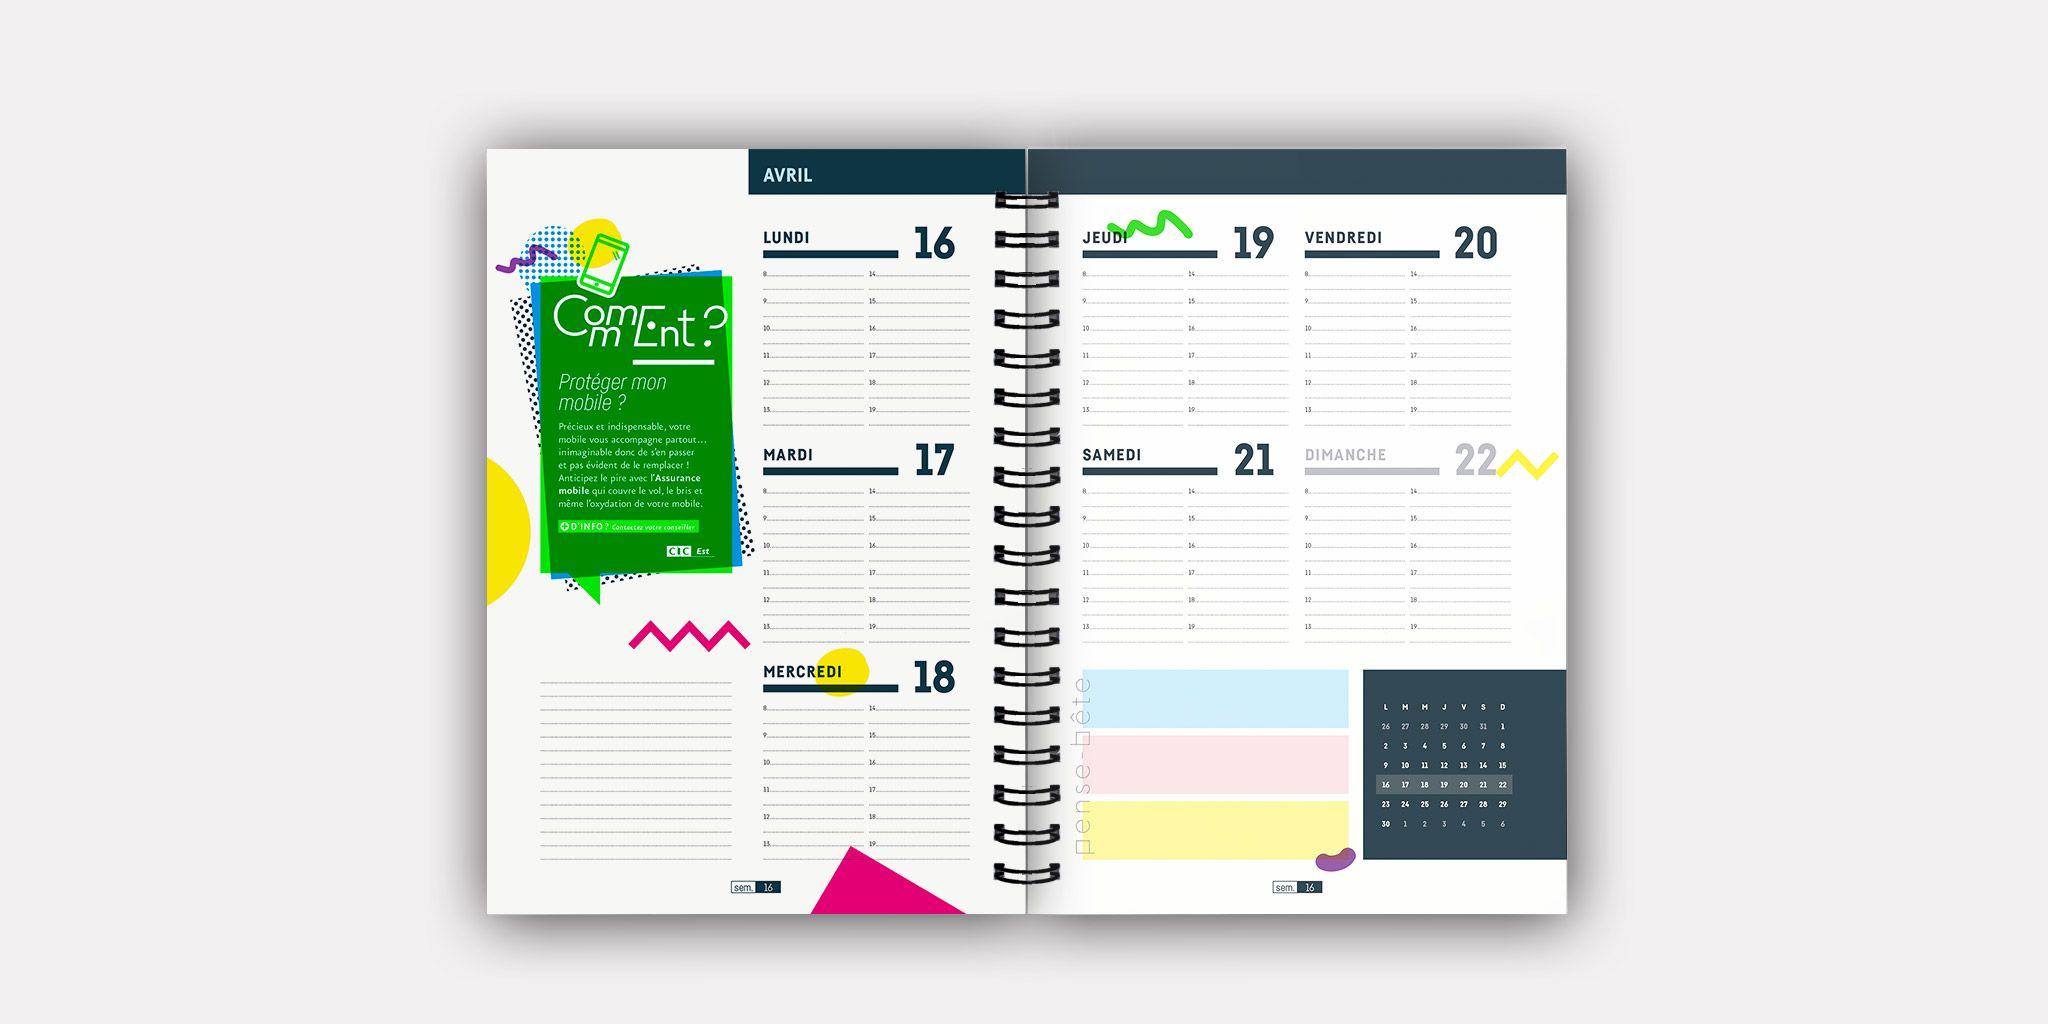 Agenda étudiants CIC-EST - AGENCE TANDEM I Communication & Design graphique